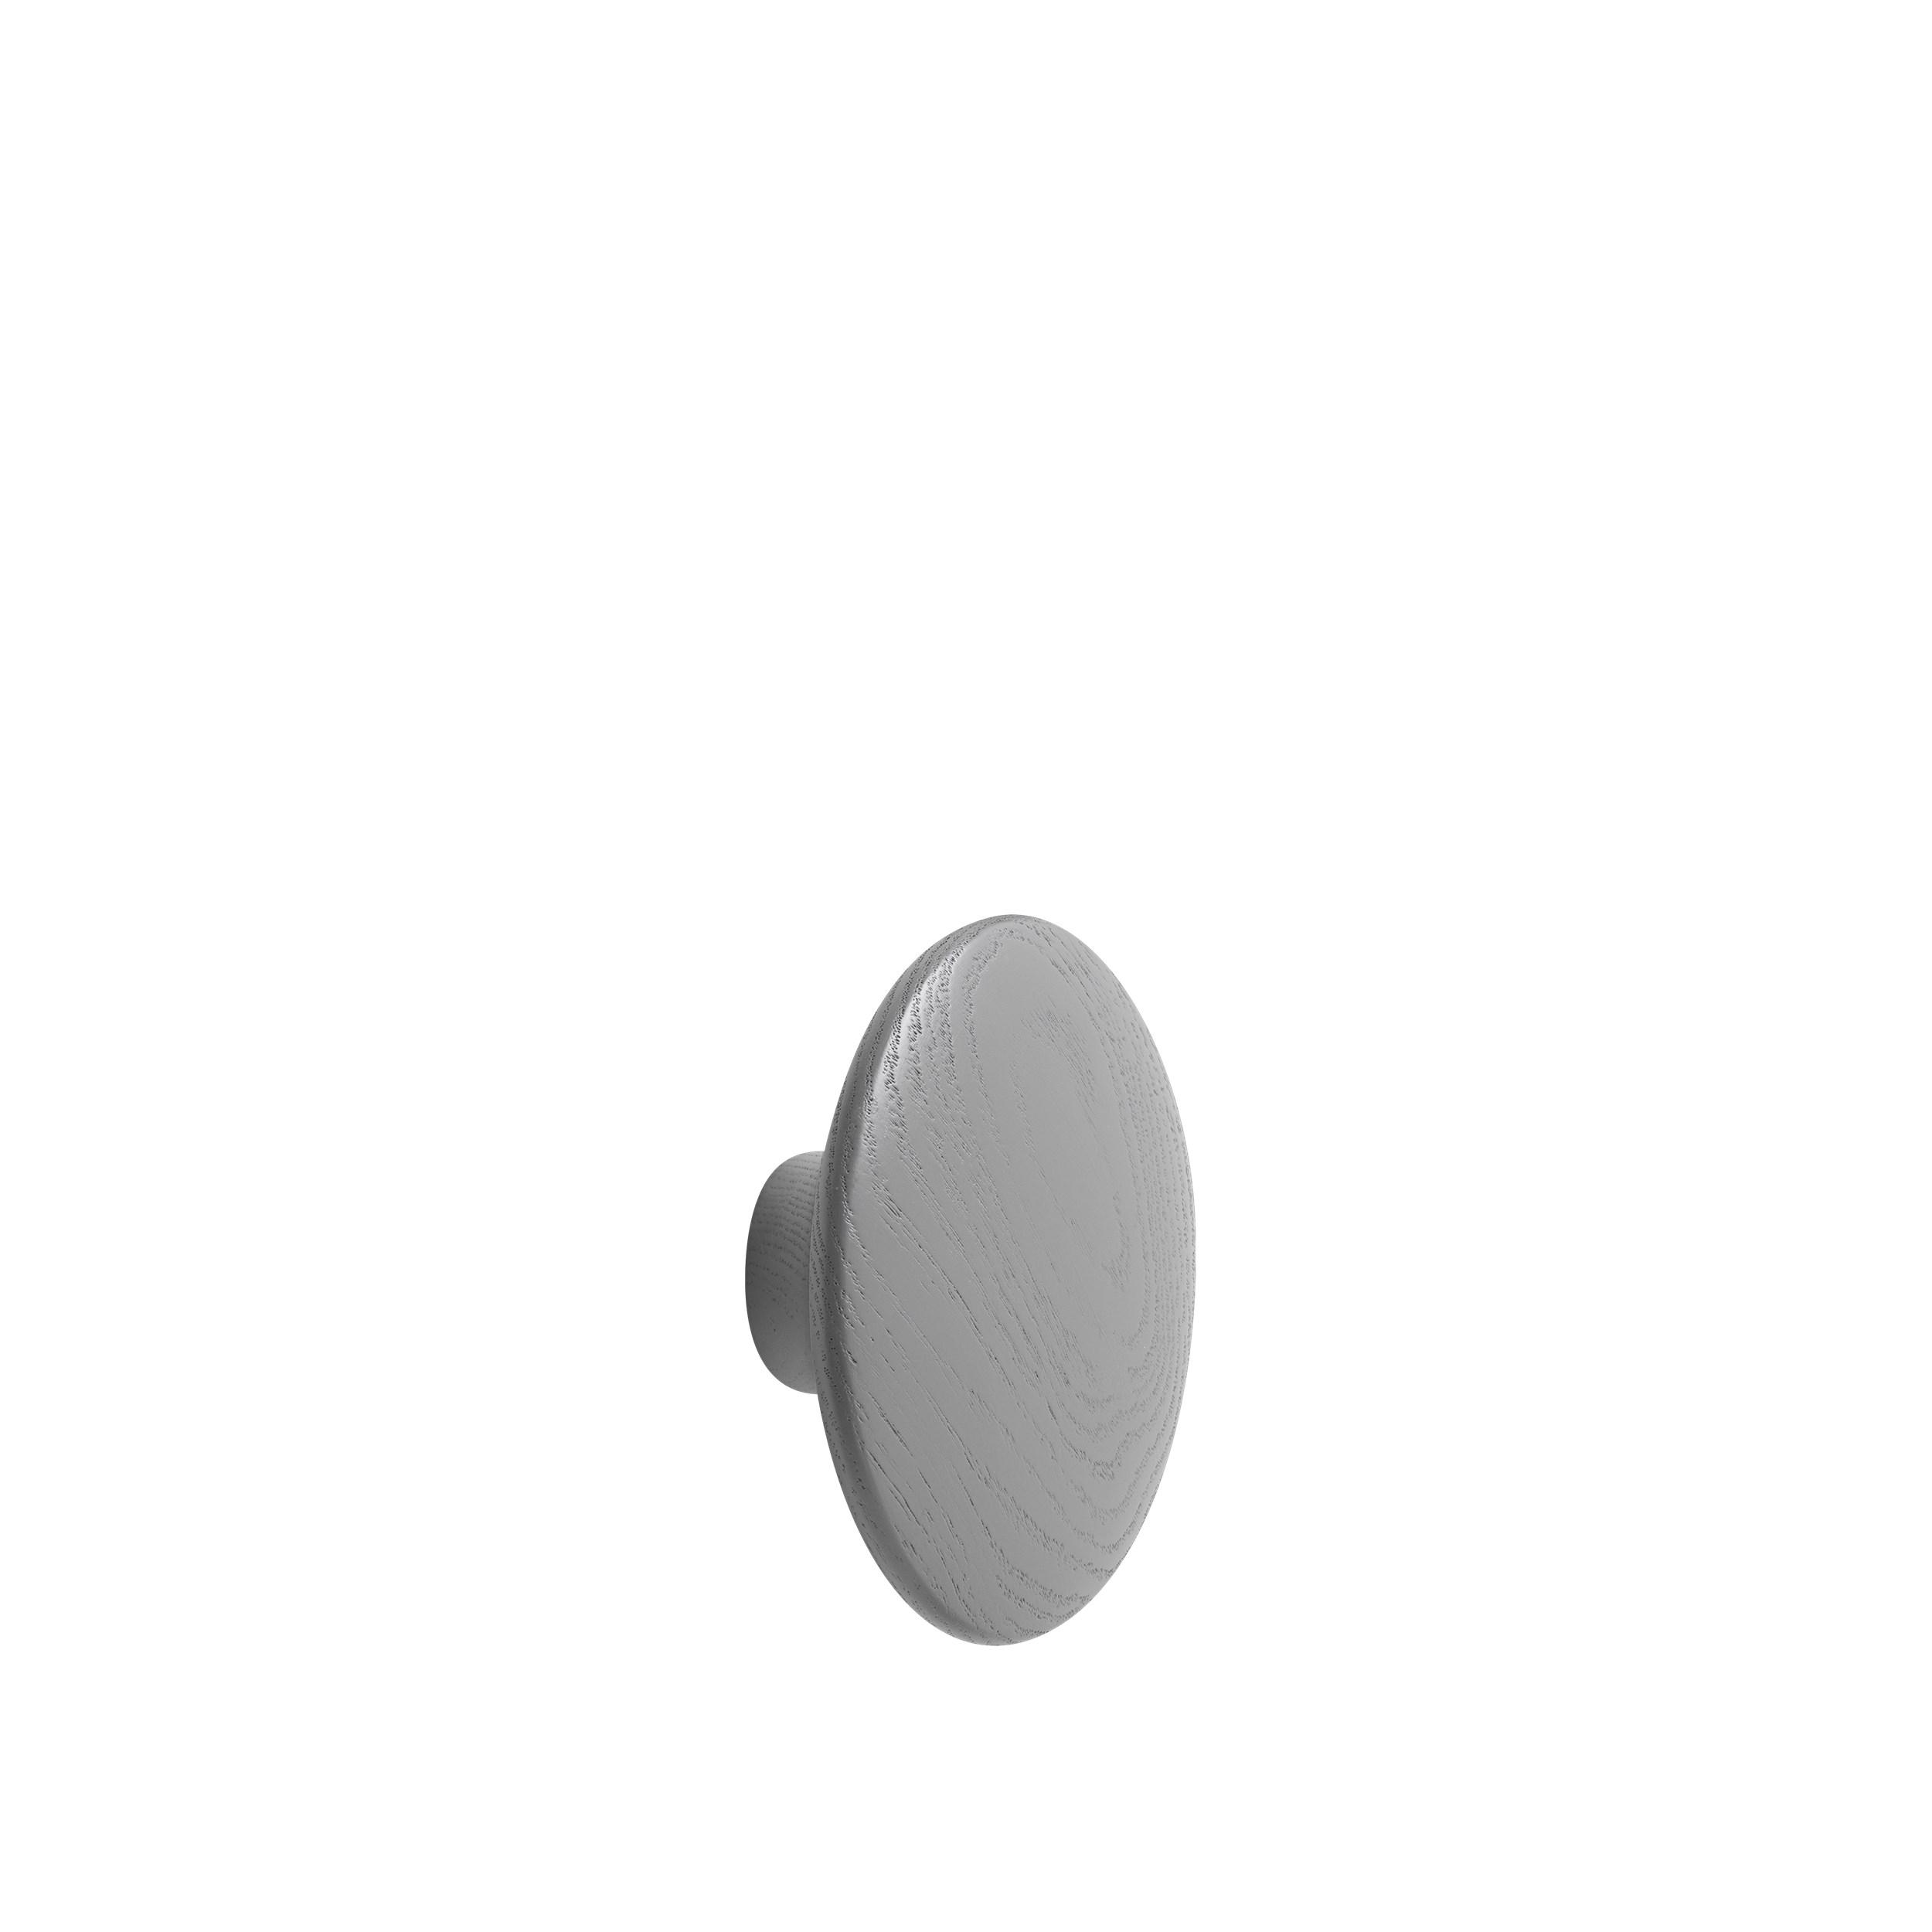 Dot wood medium Ø 13 cm dark grey